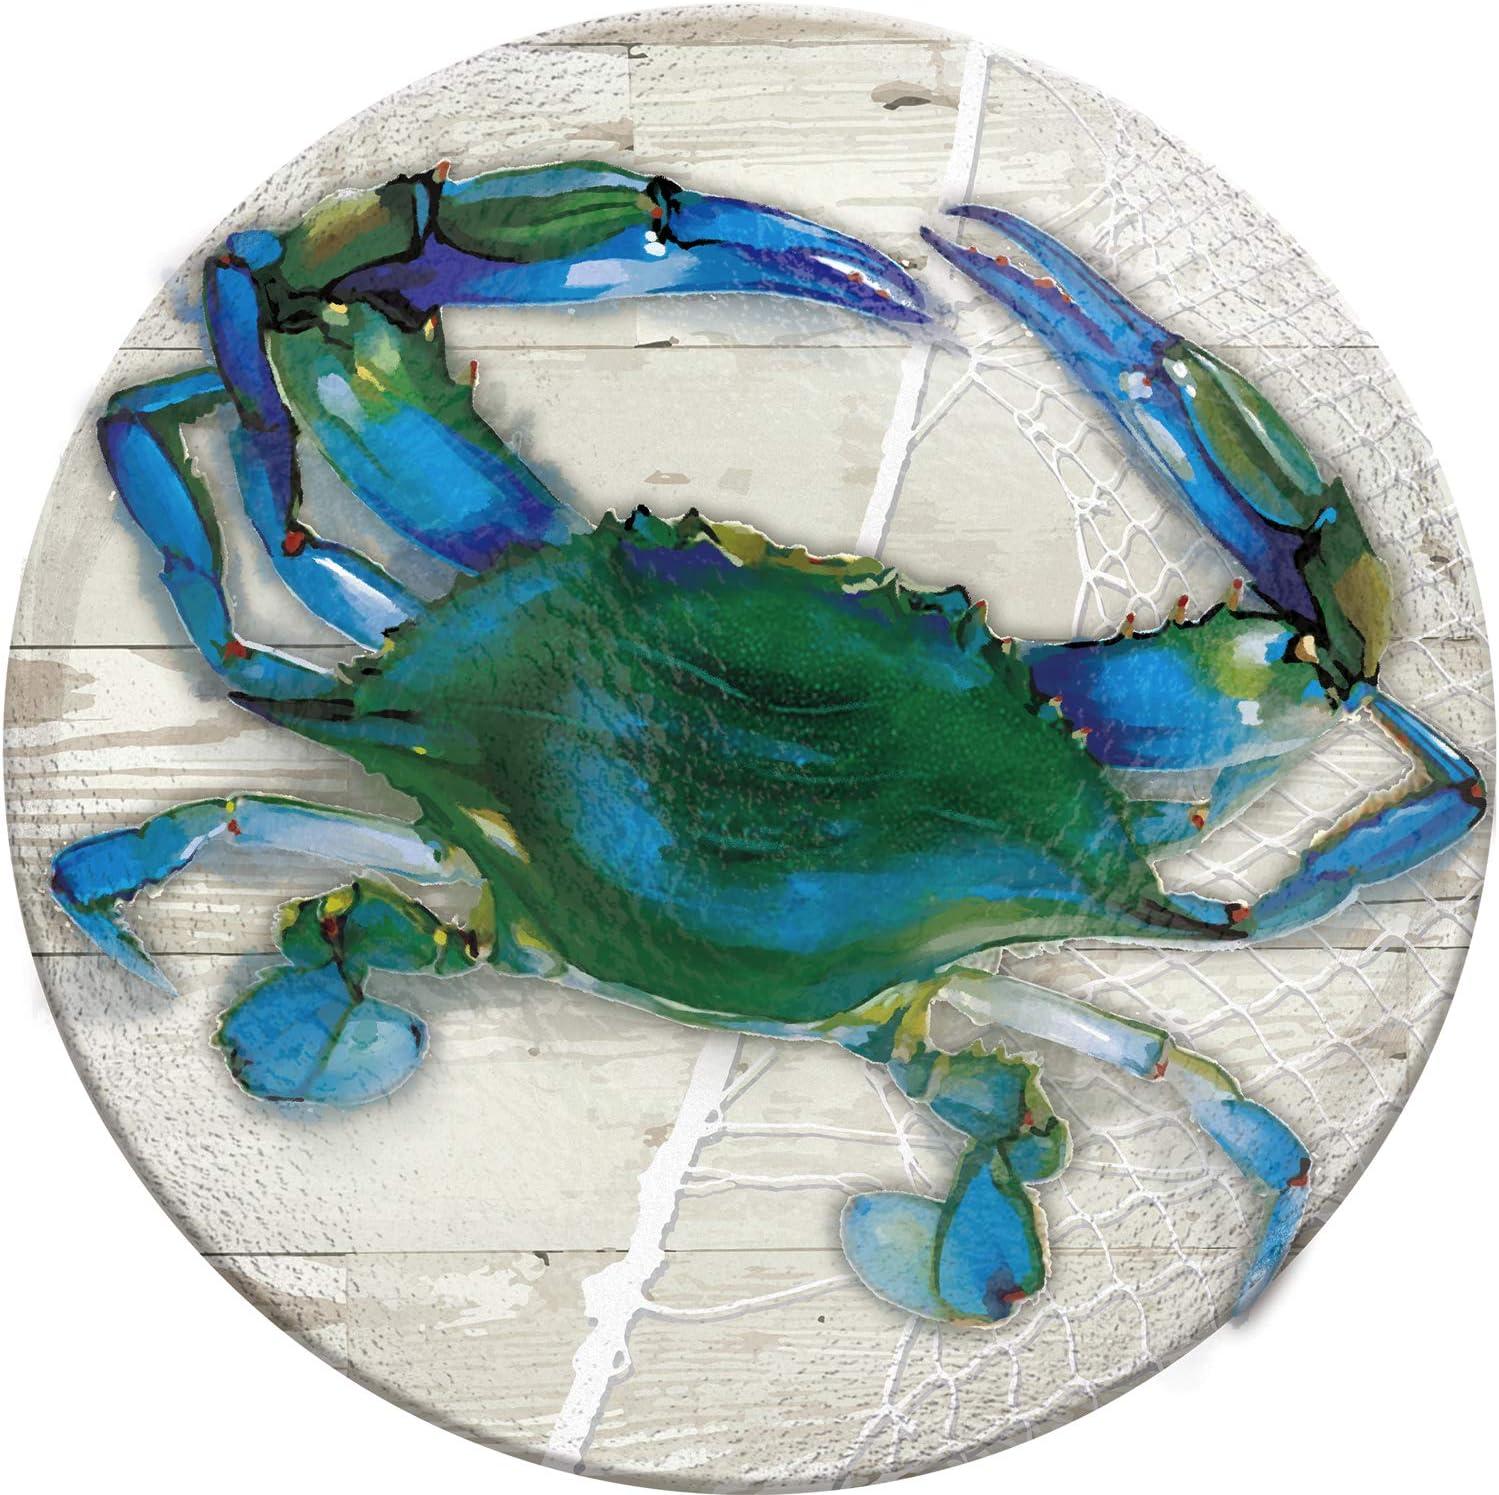 Blue Crab Evergreen Garden 18 Hand Painted Embossed Glass Bird Bath